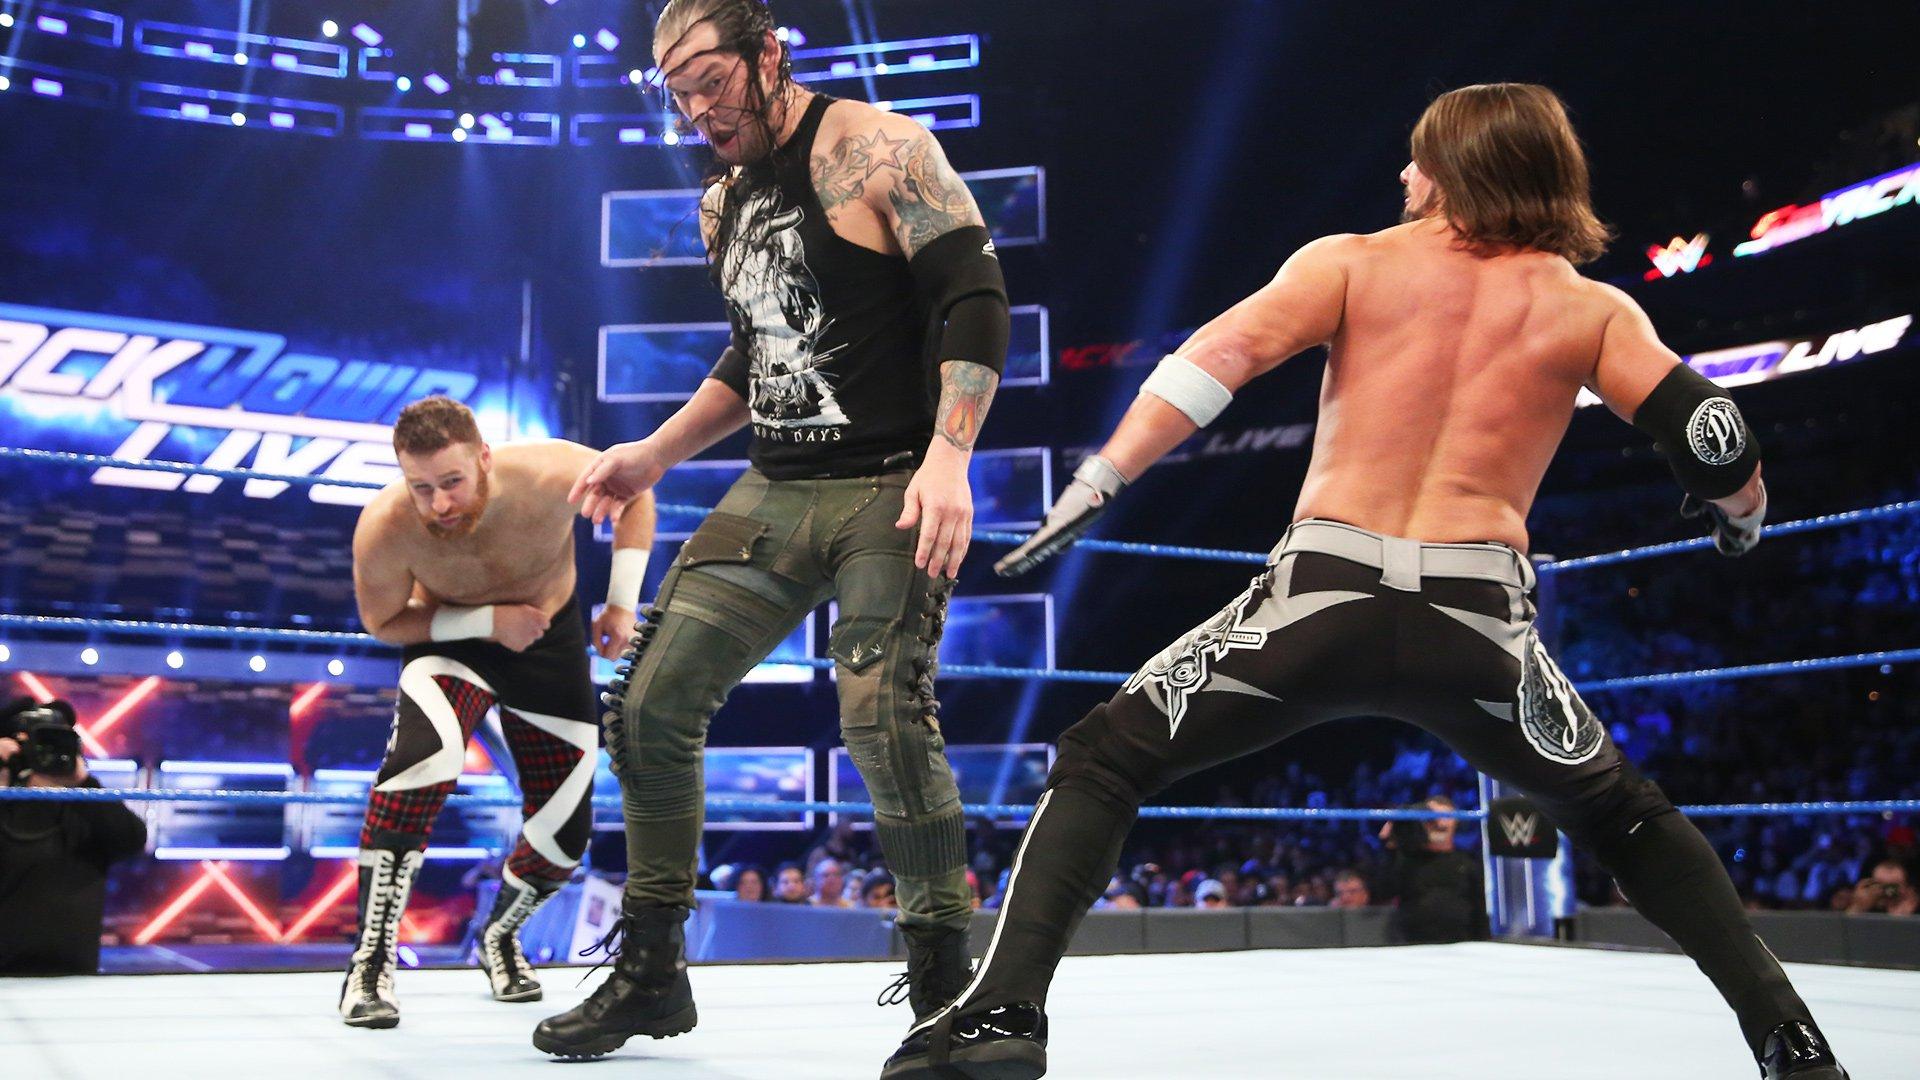 Sami Zayn vs. AJ Styles vs. Baron Corbin - Match Triple Menace pour établir l'Aspirant nº1 au titre de Champion des États-Unis: SmackDown LIVE, 11 avril 2017